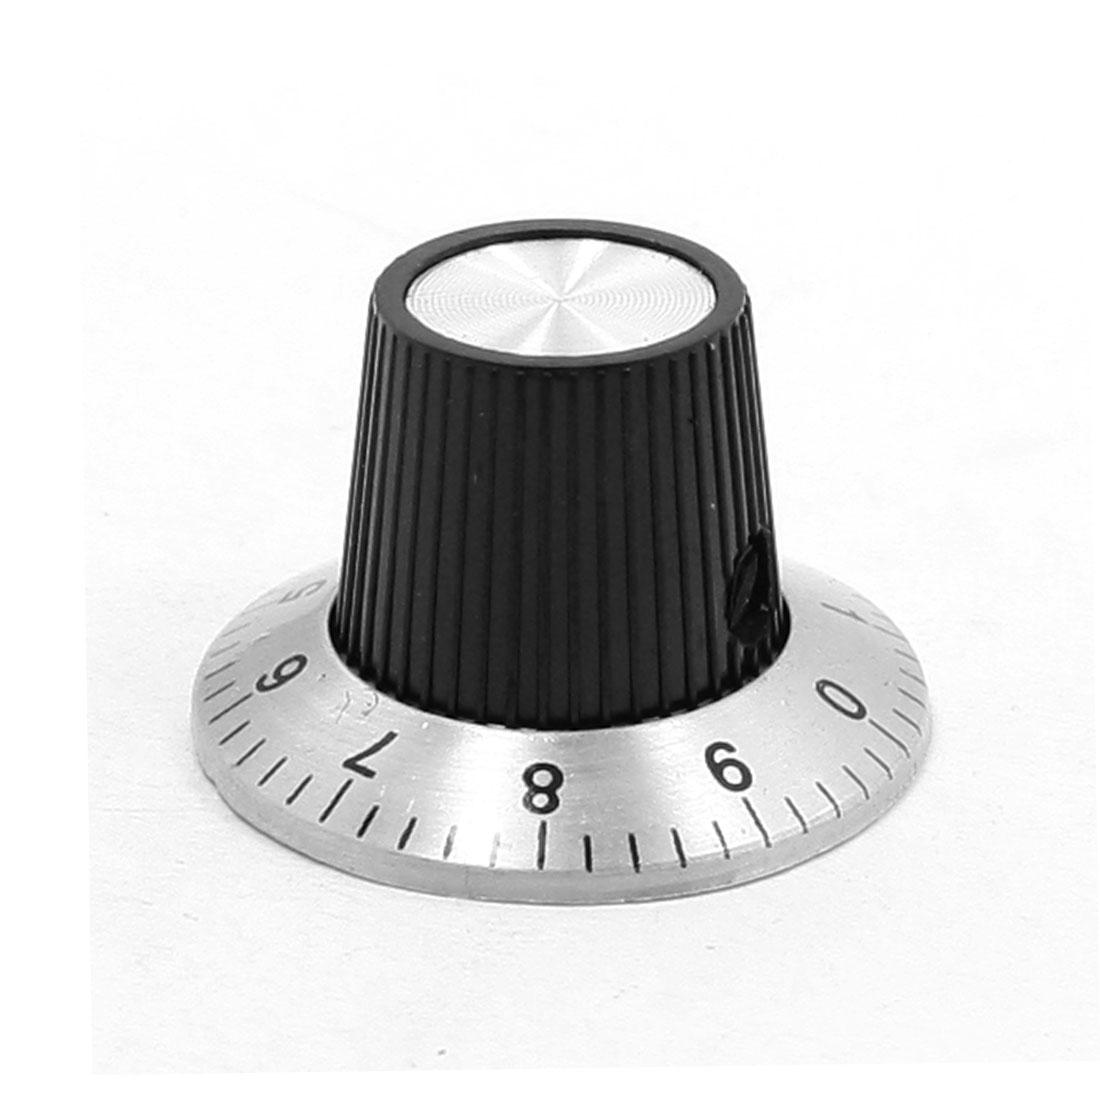 29mm x 18mm Potentiometer Control Volume Rotary Digital Knob Cap